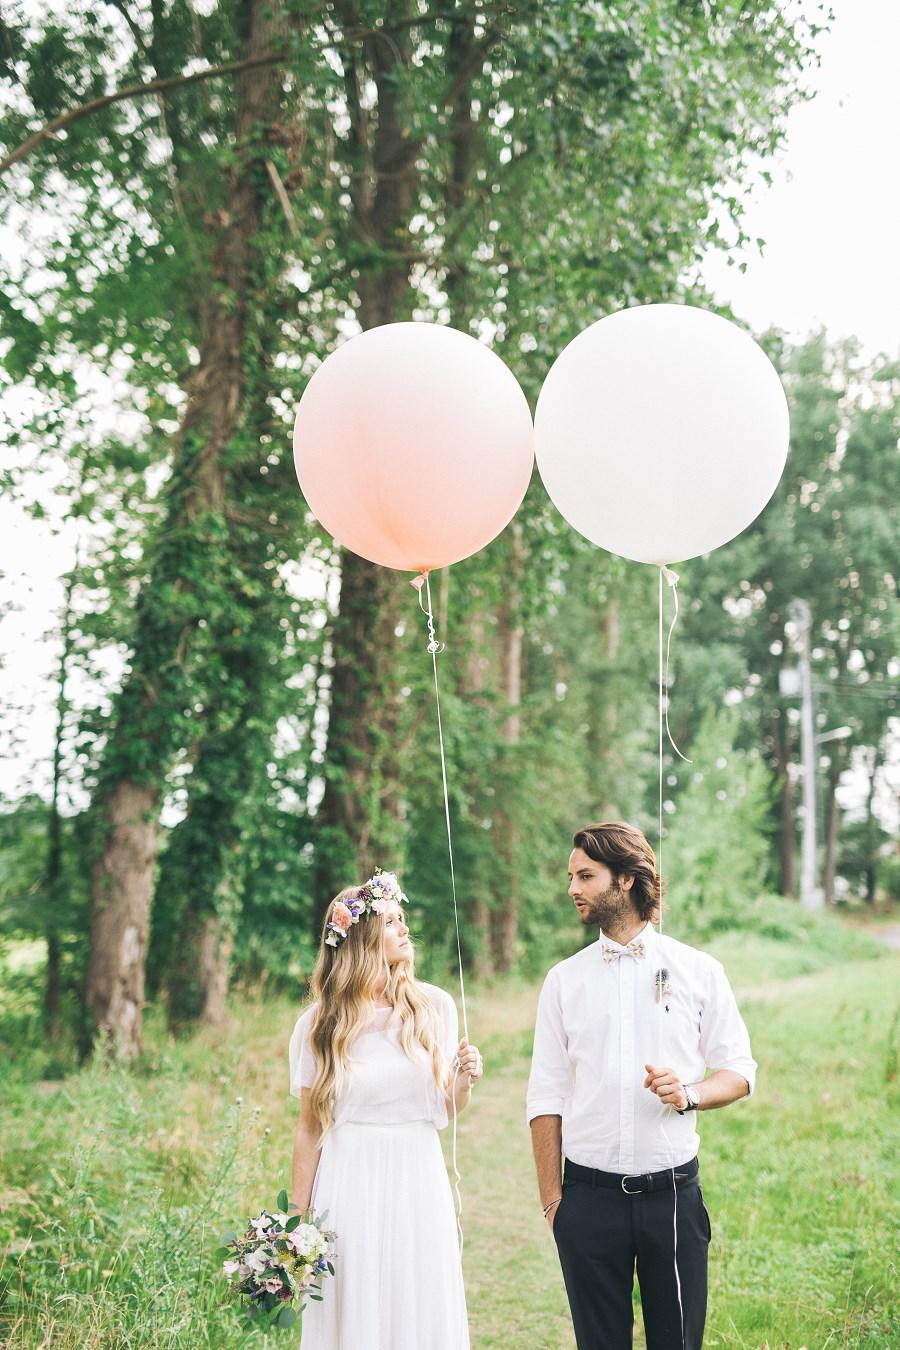 Lovetralala_shooting d'inspiration kiss the bride_23